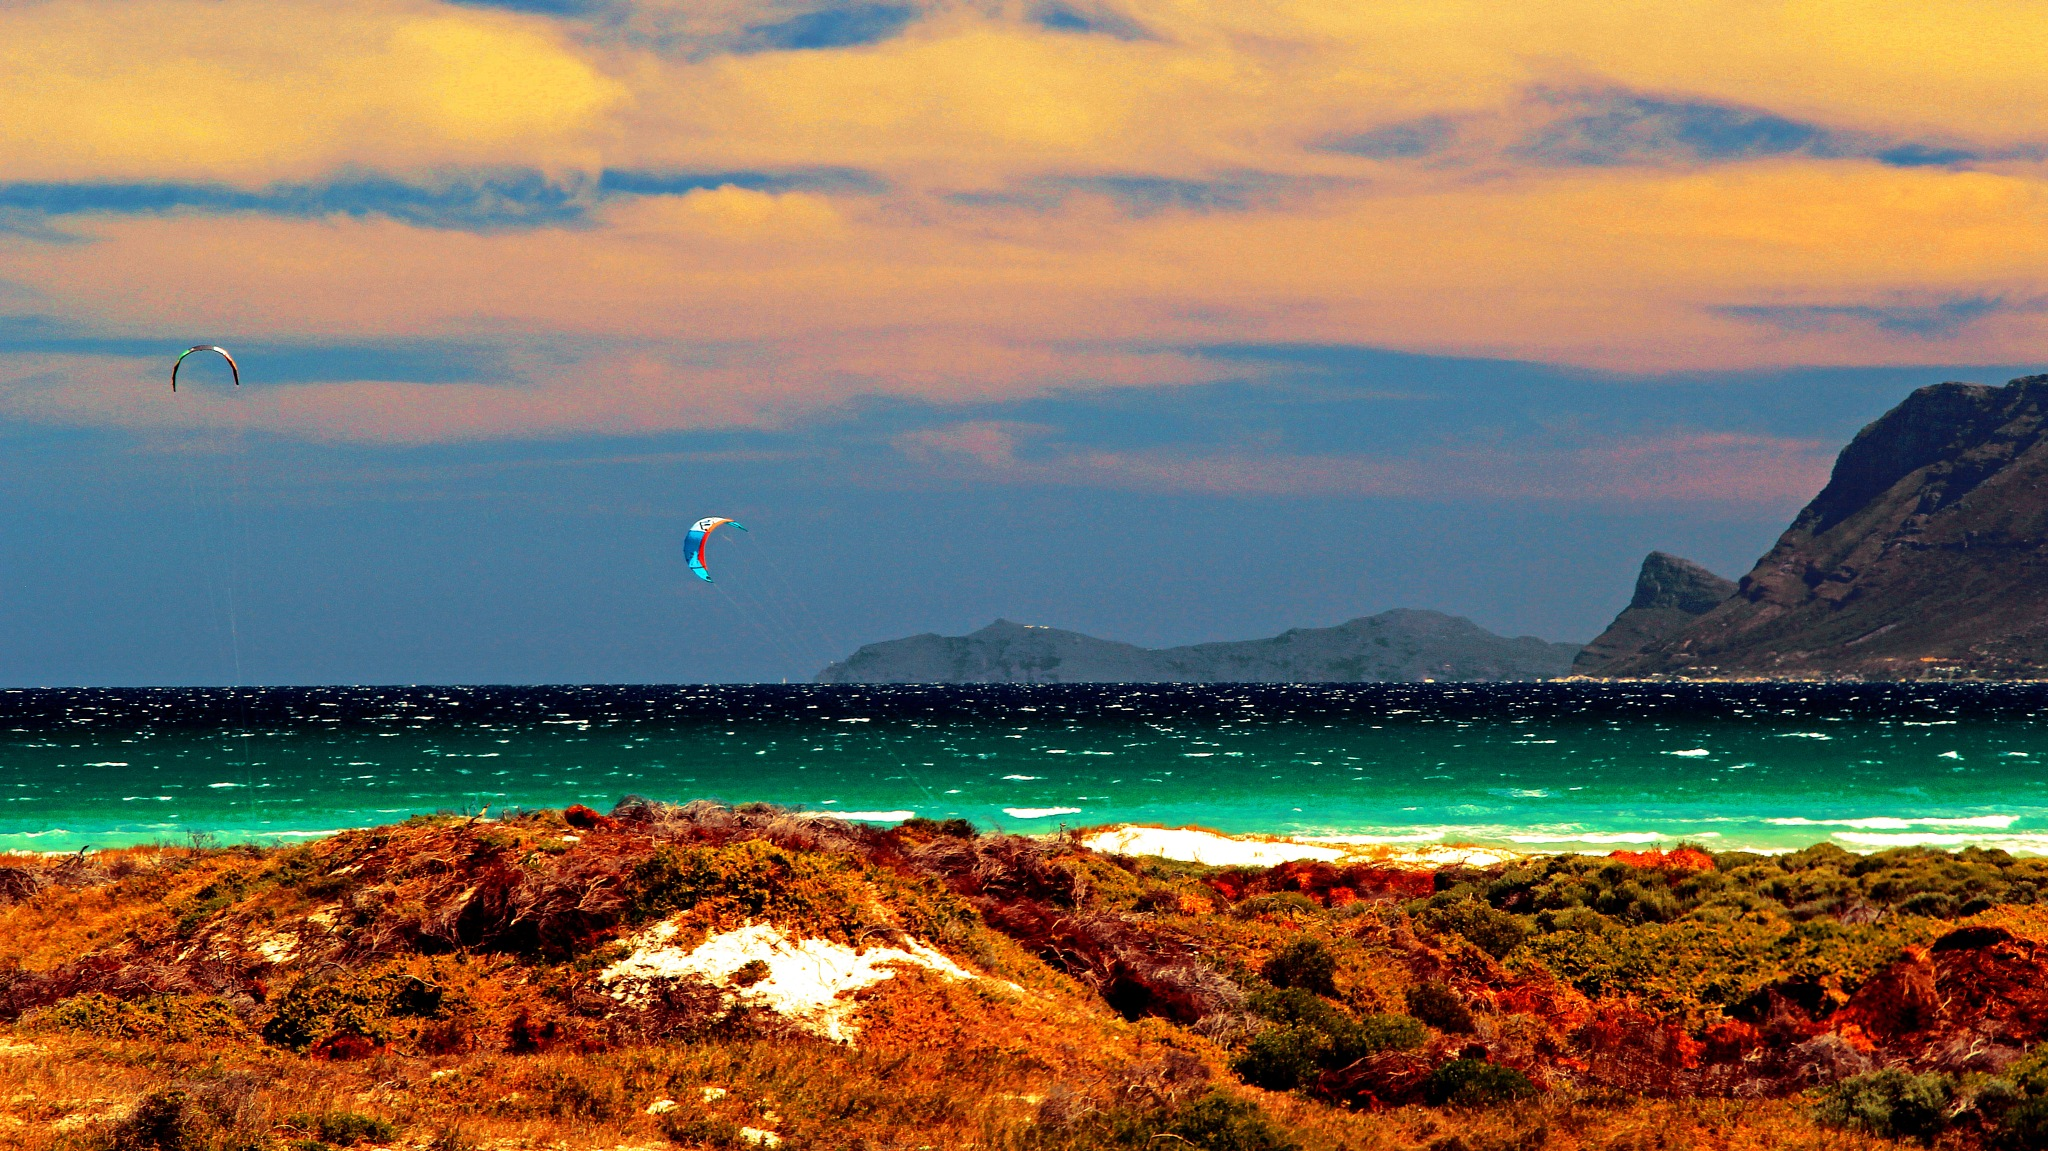 Kite Surfers by Nauta Piscatorque